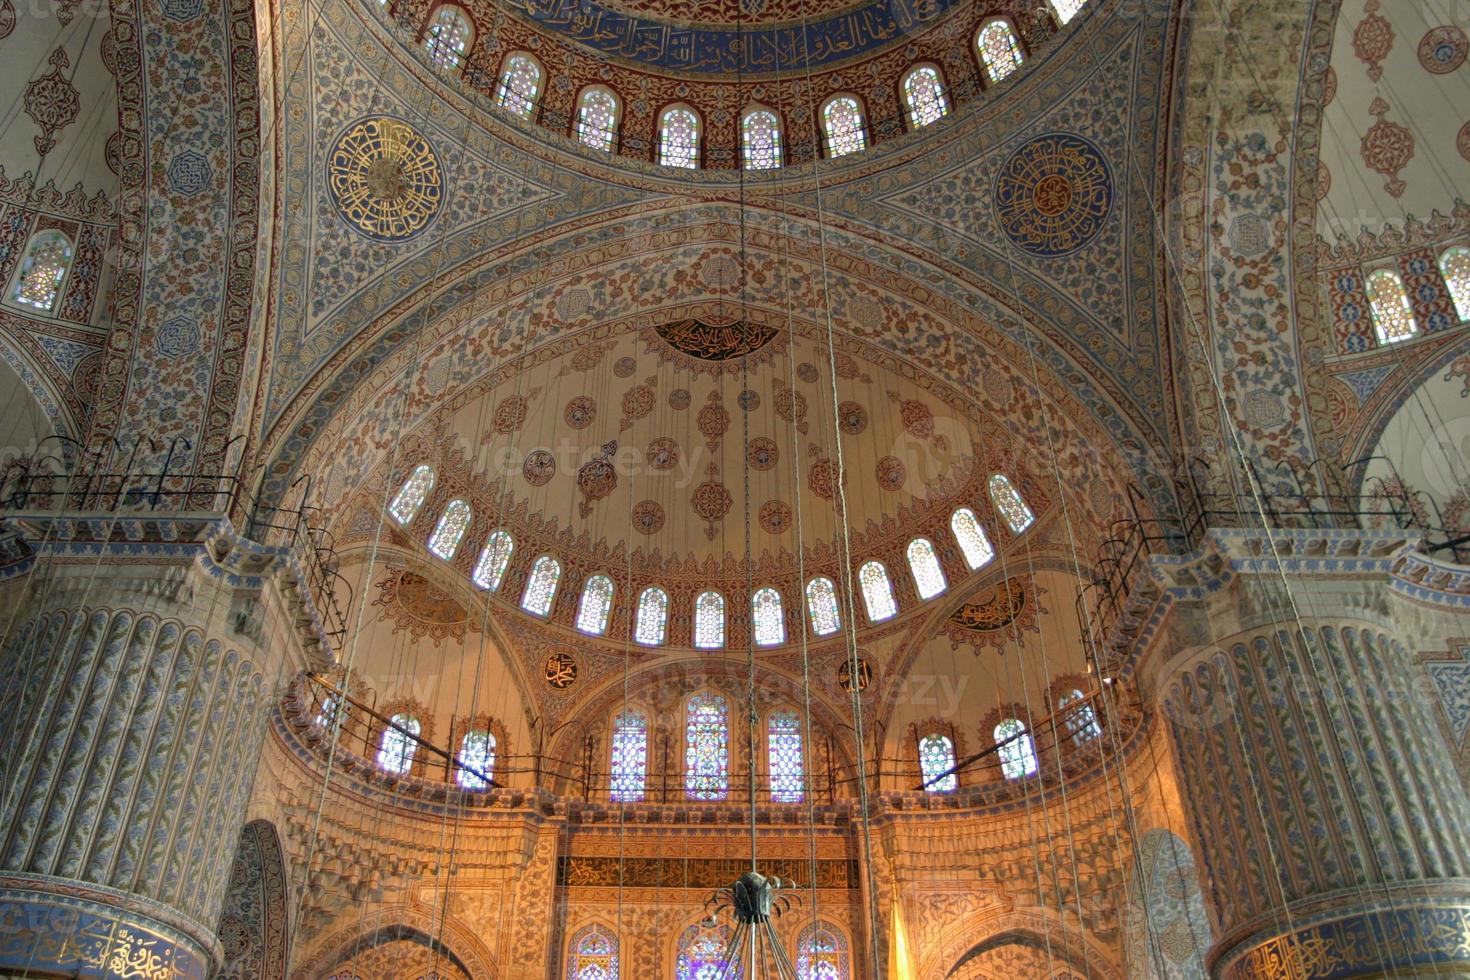 vista interior da mesquita azul em Istambul, Turquia foto